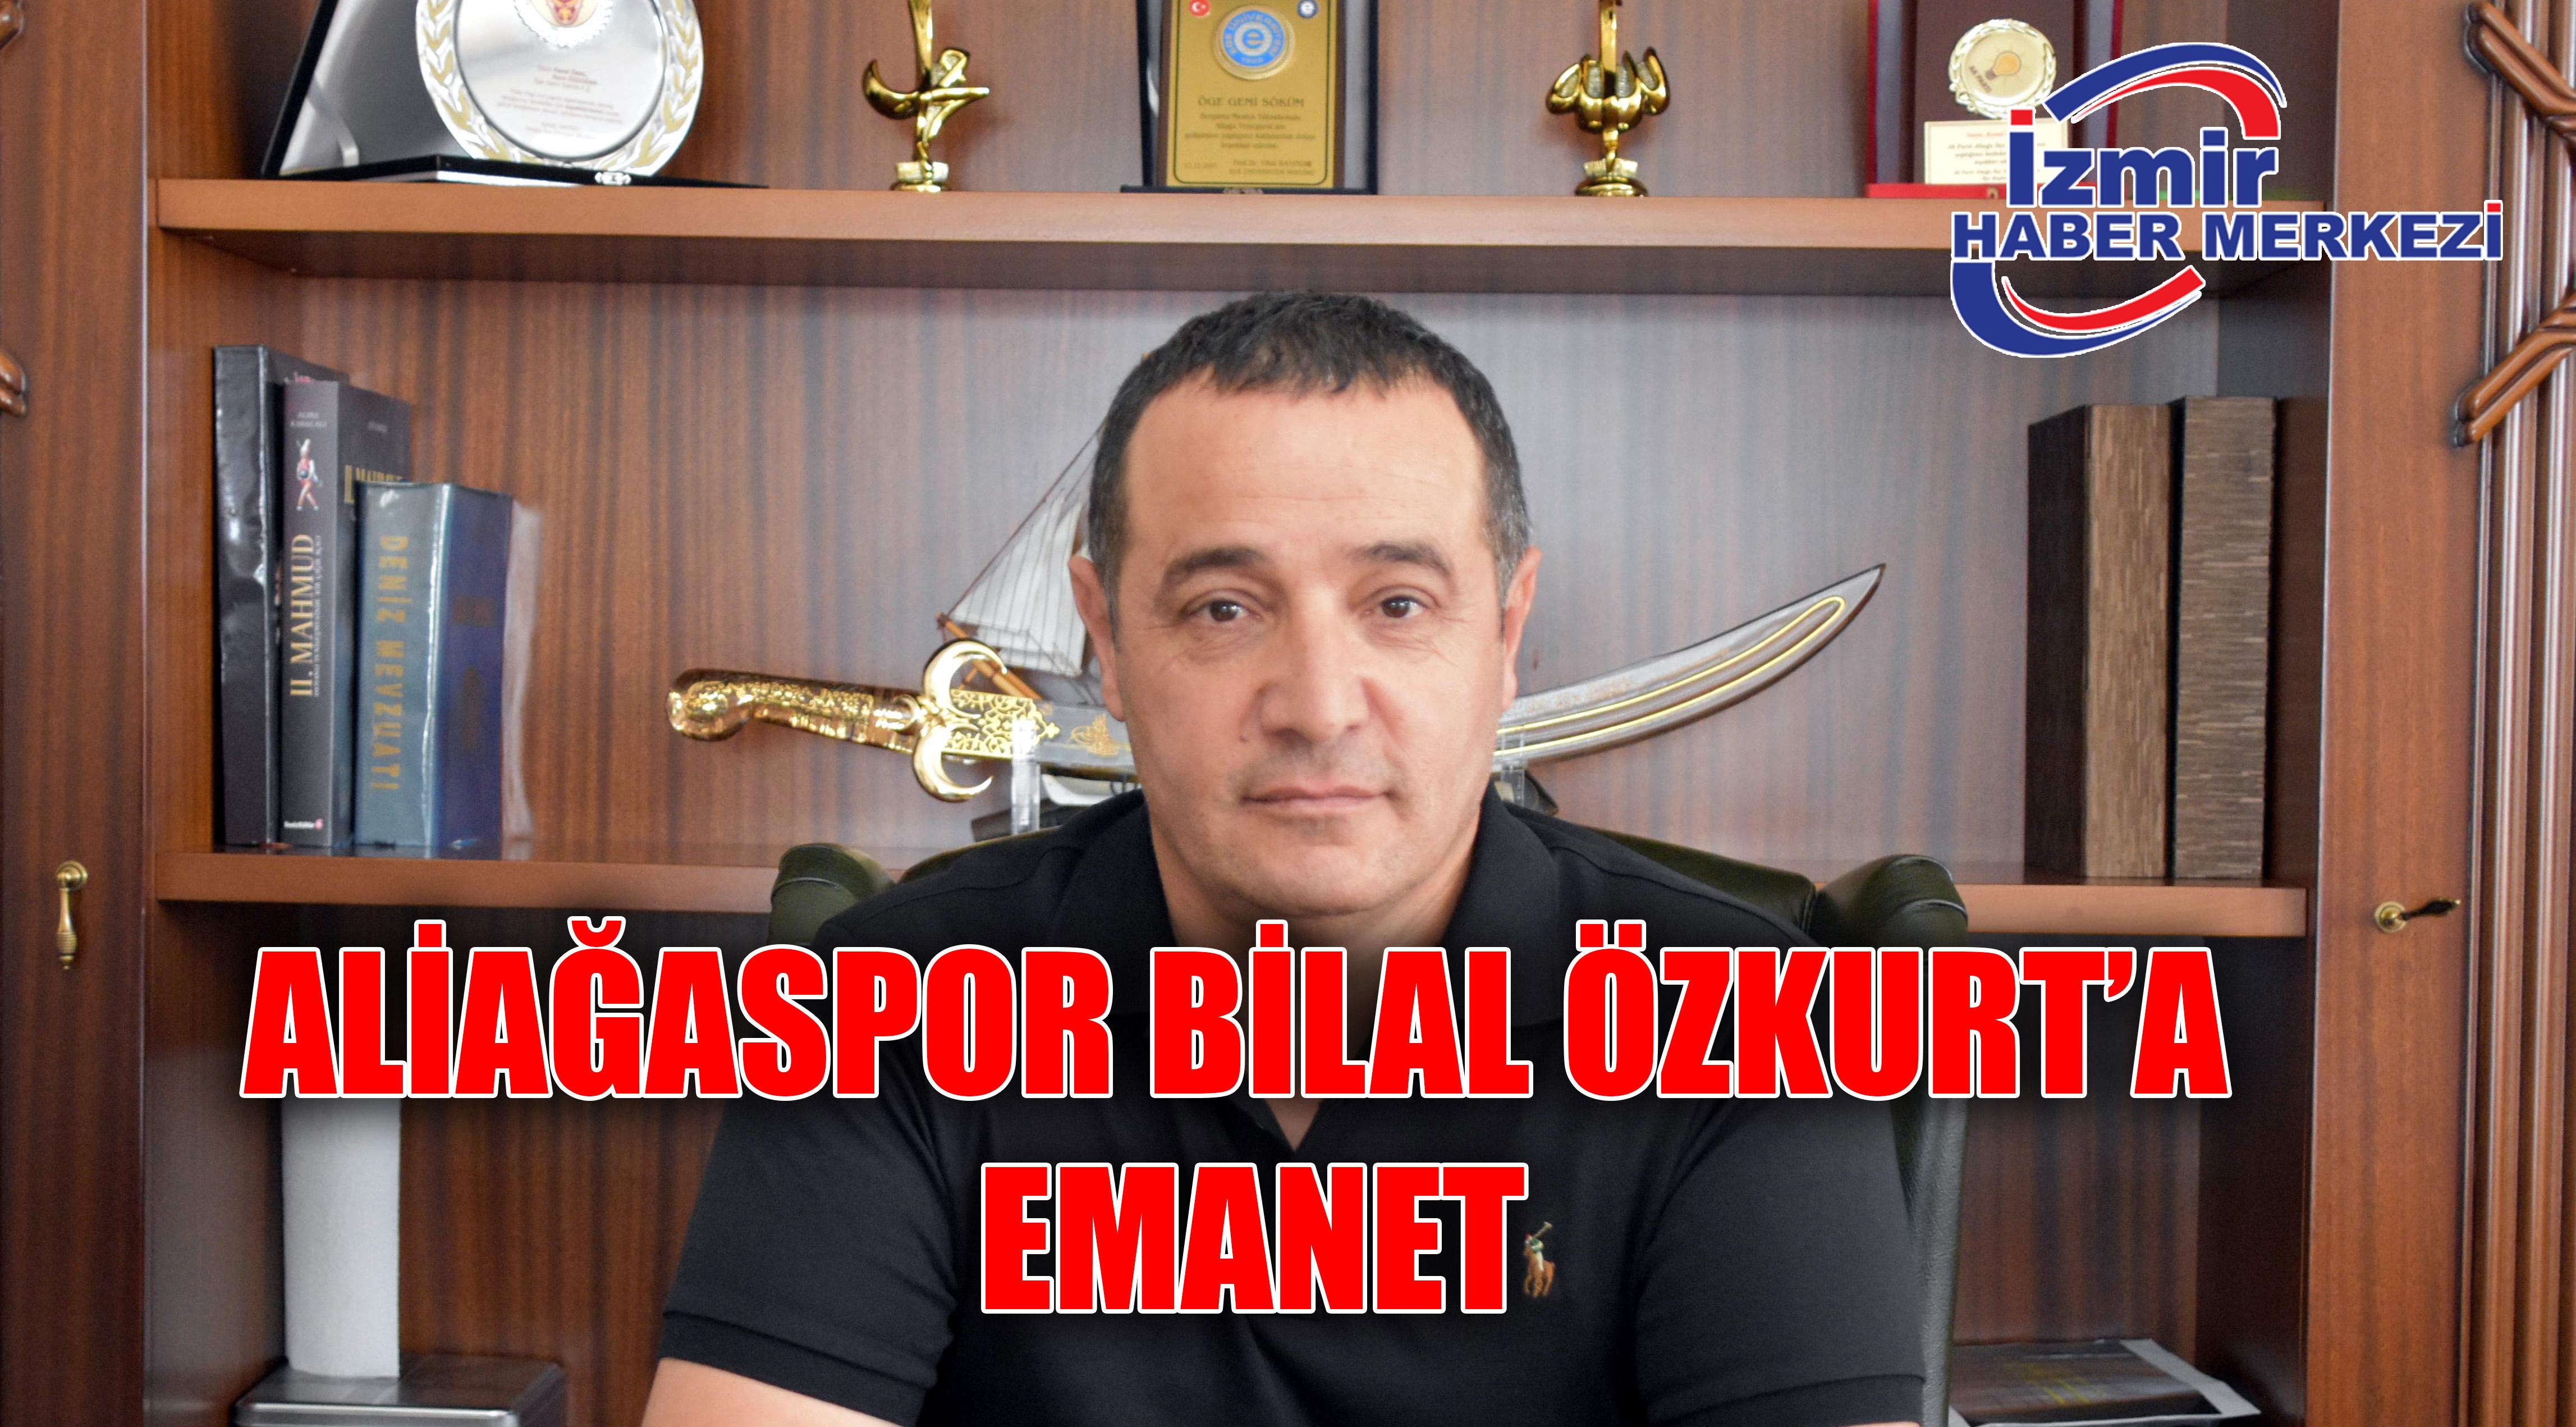 ALİAĞASPOR BİLAL ÖZKURT'A EMANET